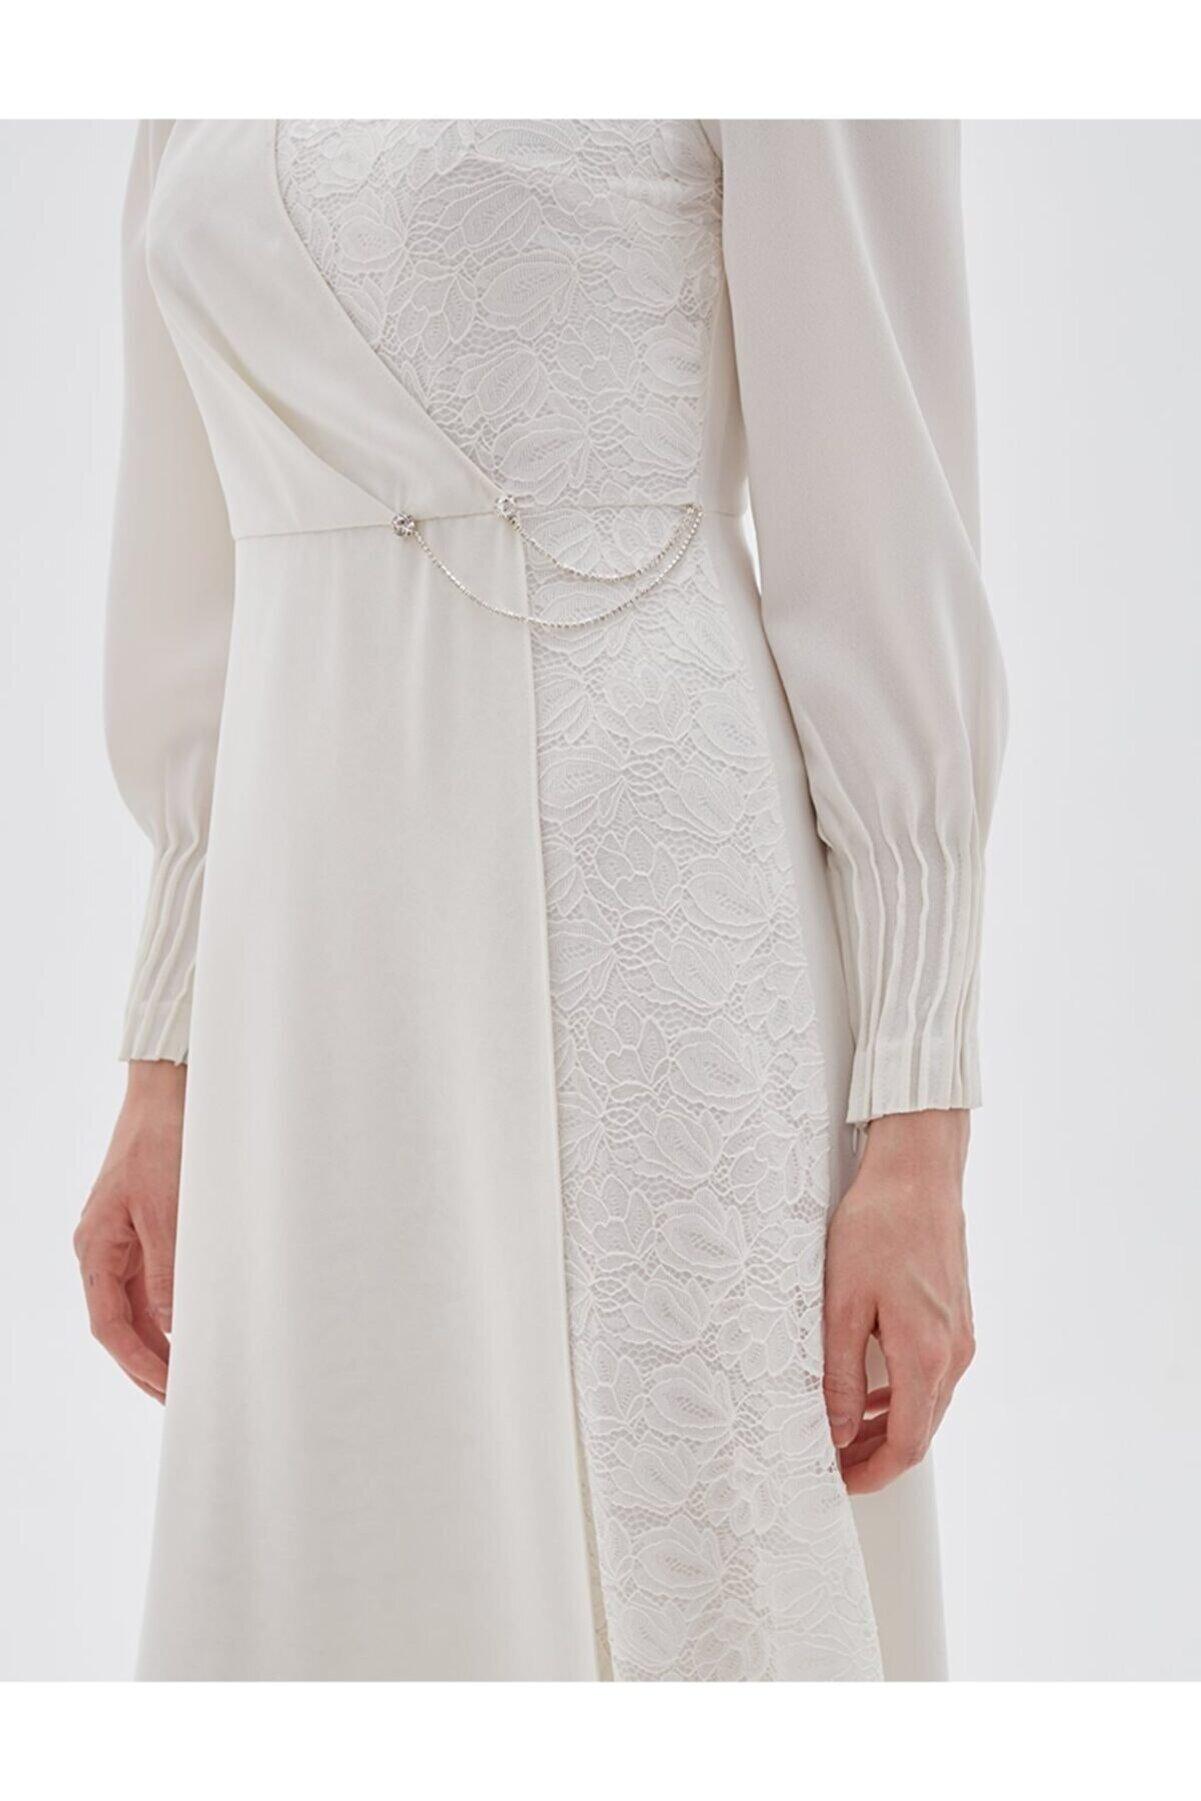 Kayra Drapeli Dantel Elbise Beyaz A20 23006